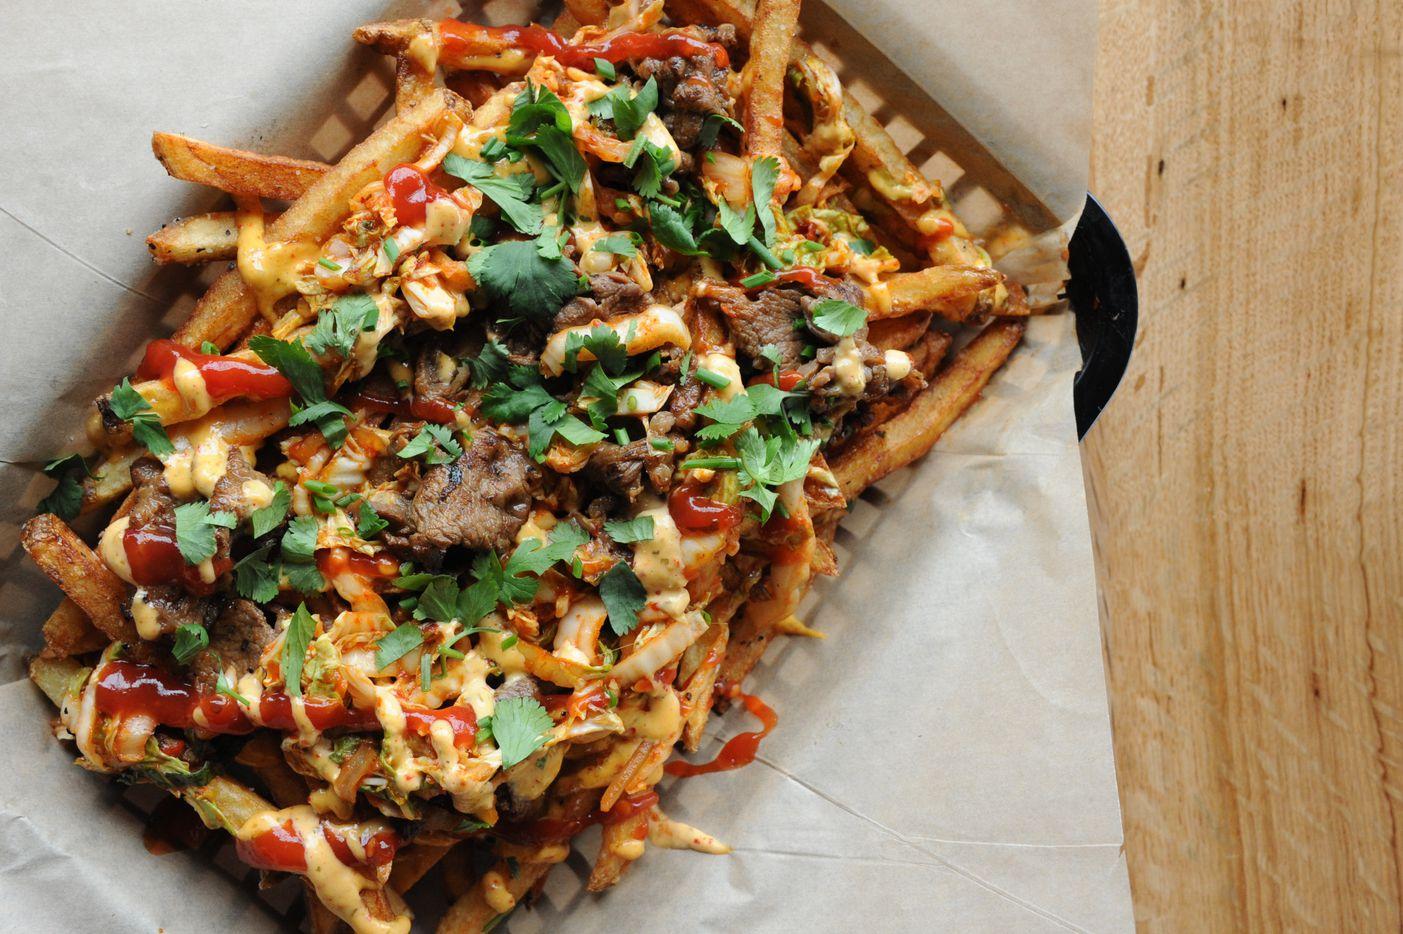 Bulgogi kimchi fries are served at Spork in Far North Dallas, TX on March 15, 2015. (Alexandra Olivia/ Special Contributor)